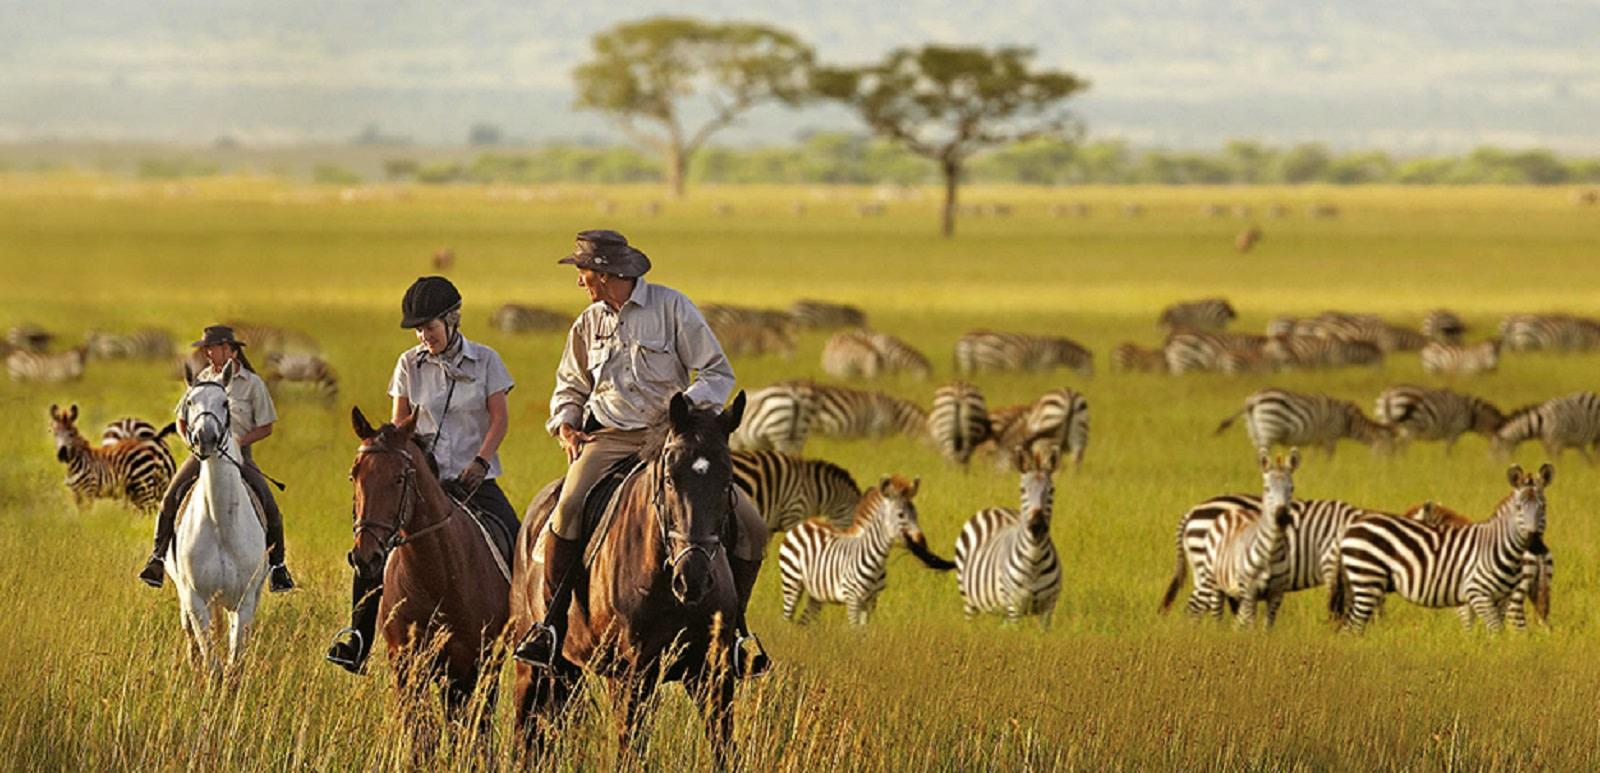 Tanzania Tours - horse riding